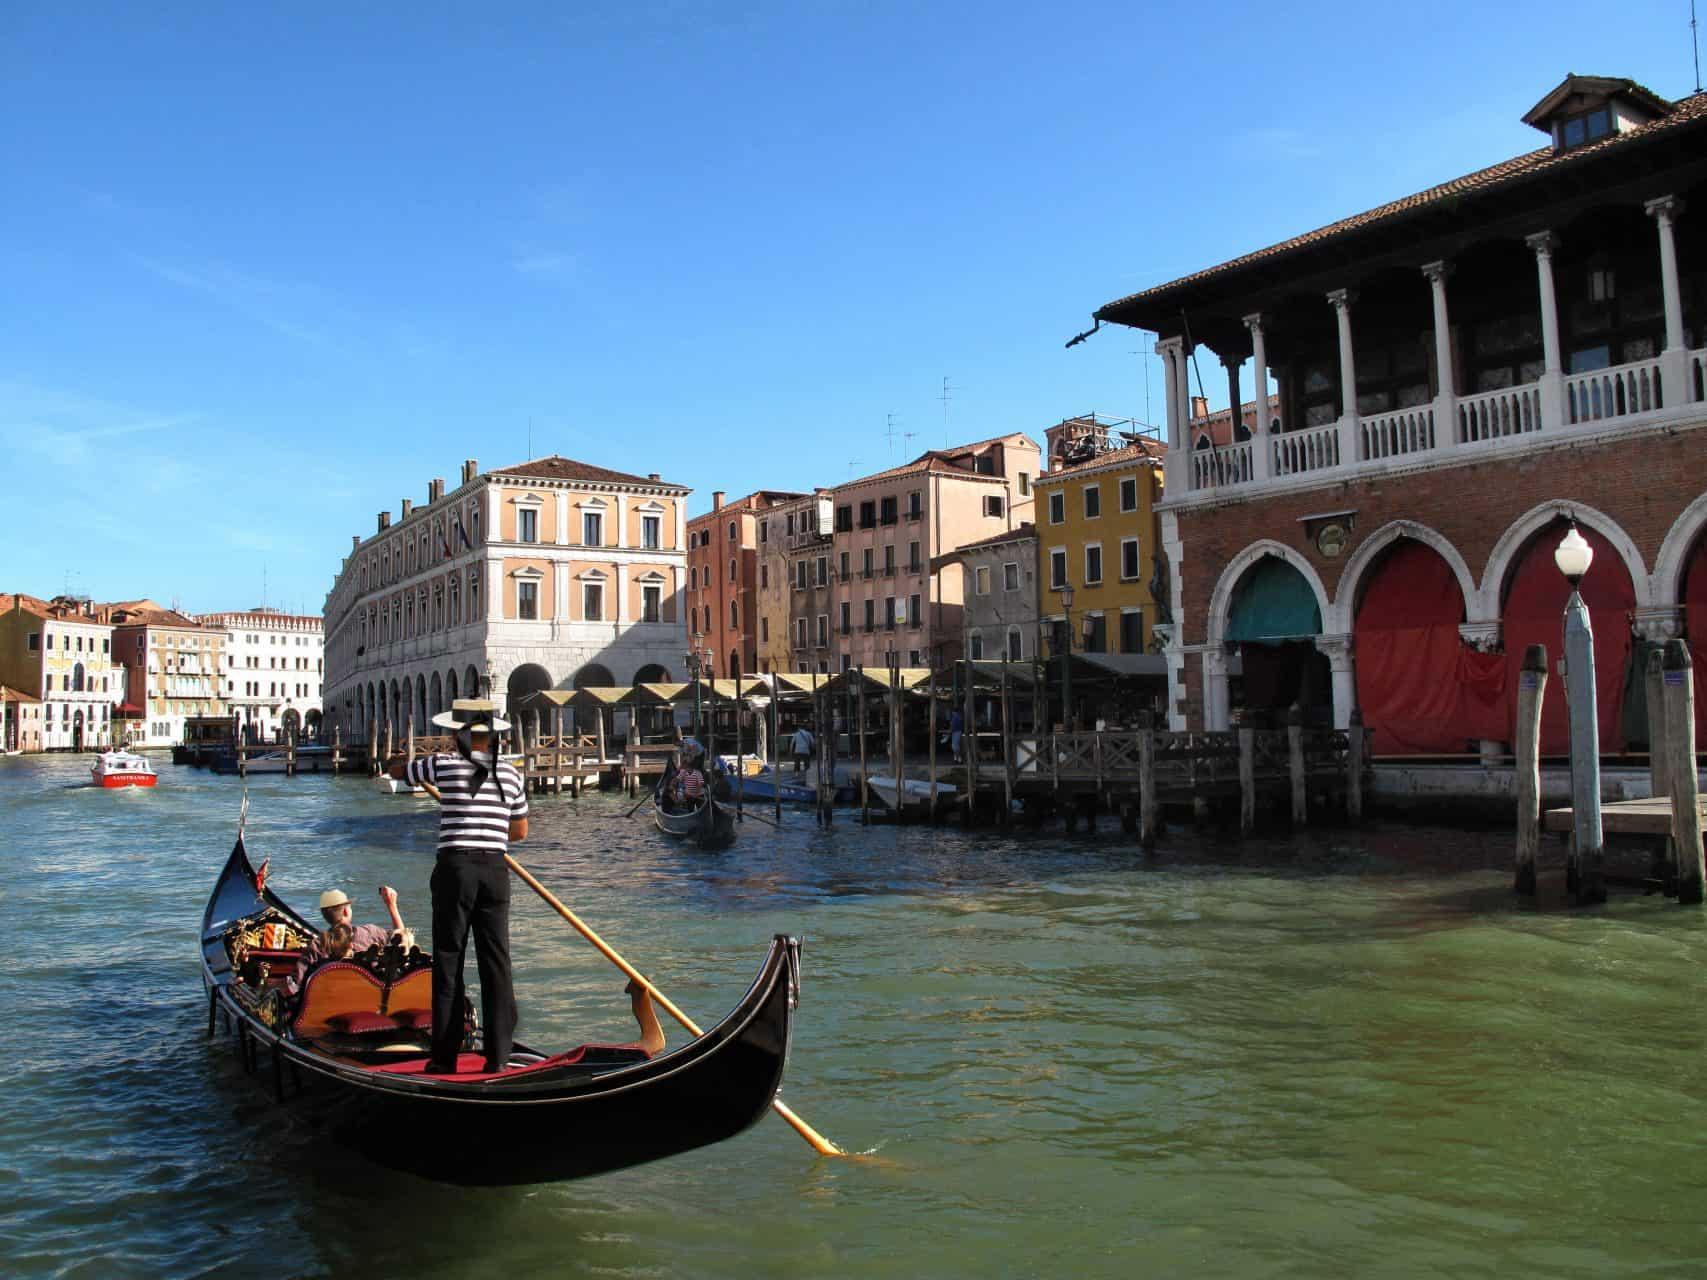 Ride a gondola